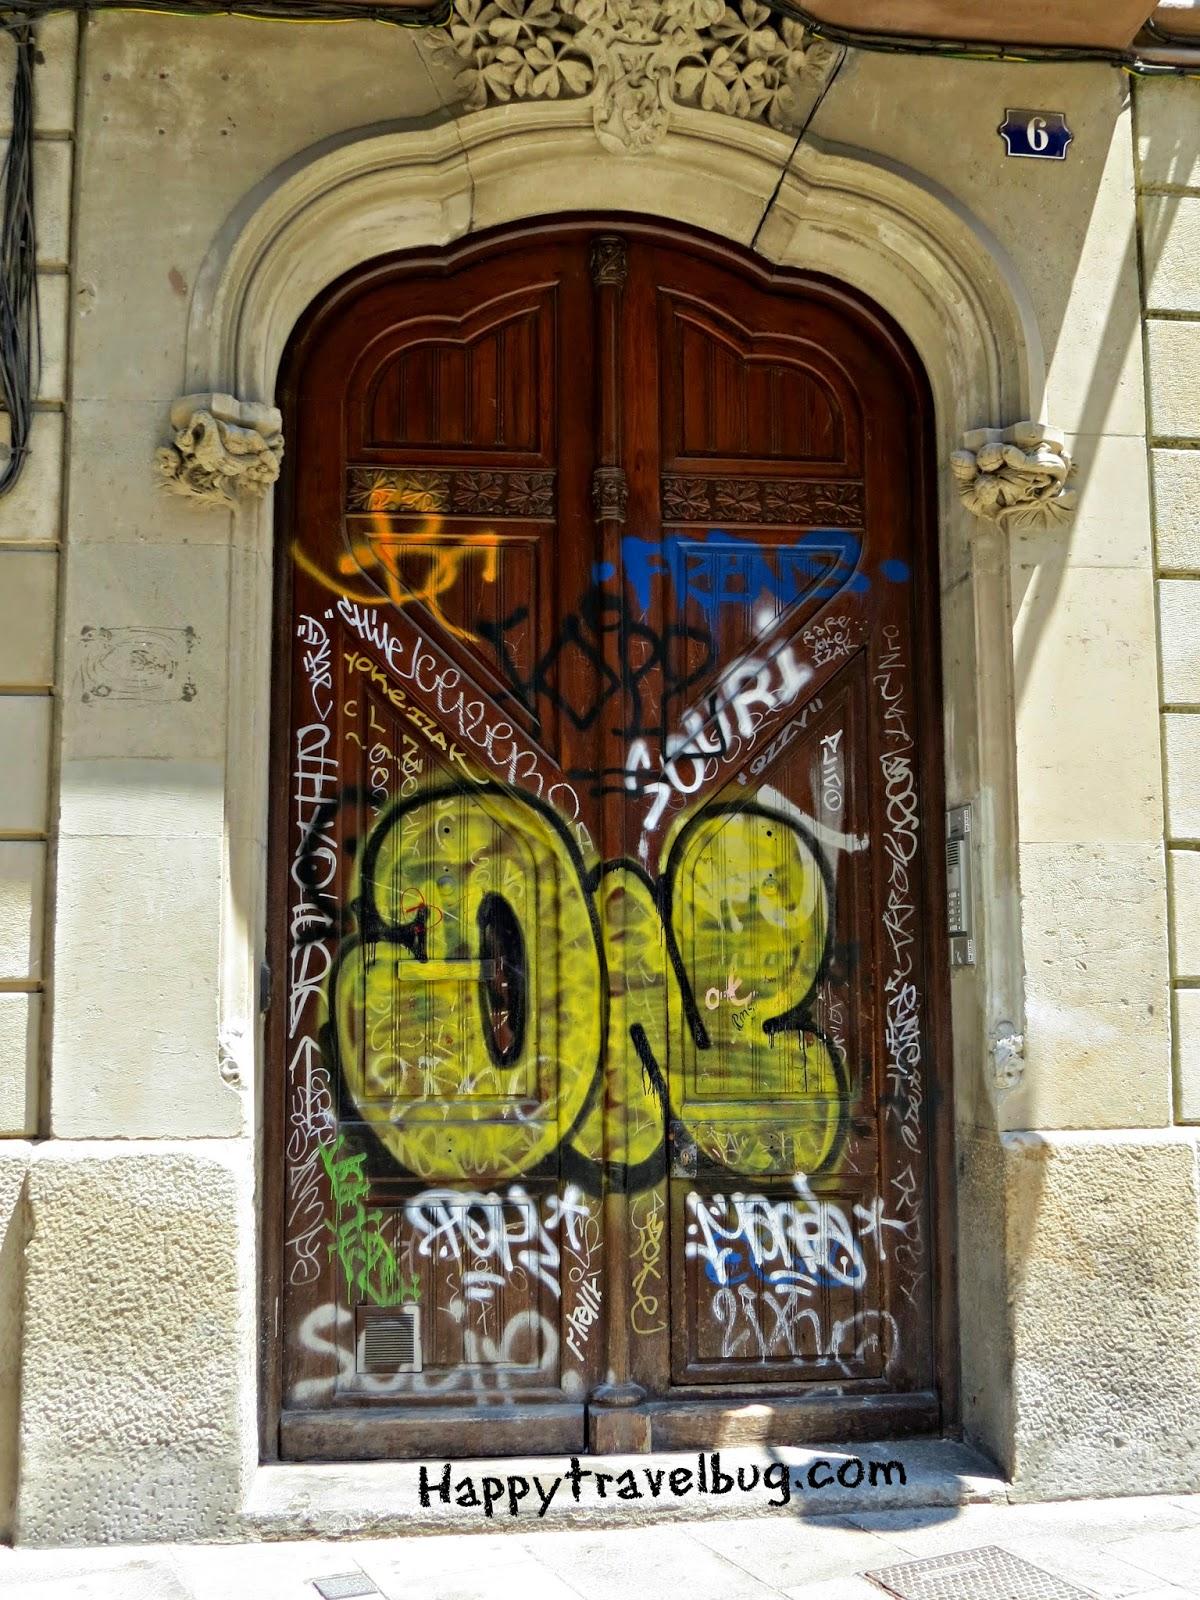 Graffiti door in Barcelona, Spain